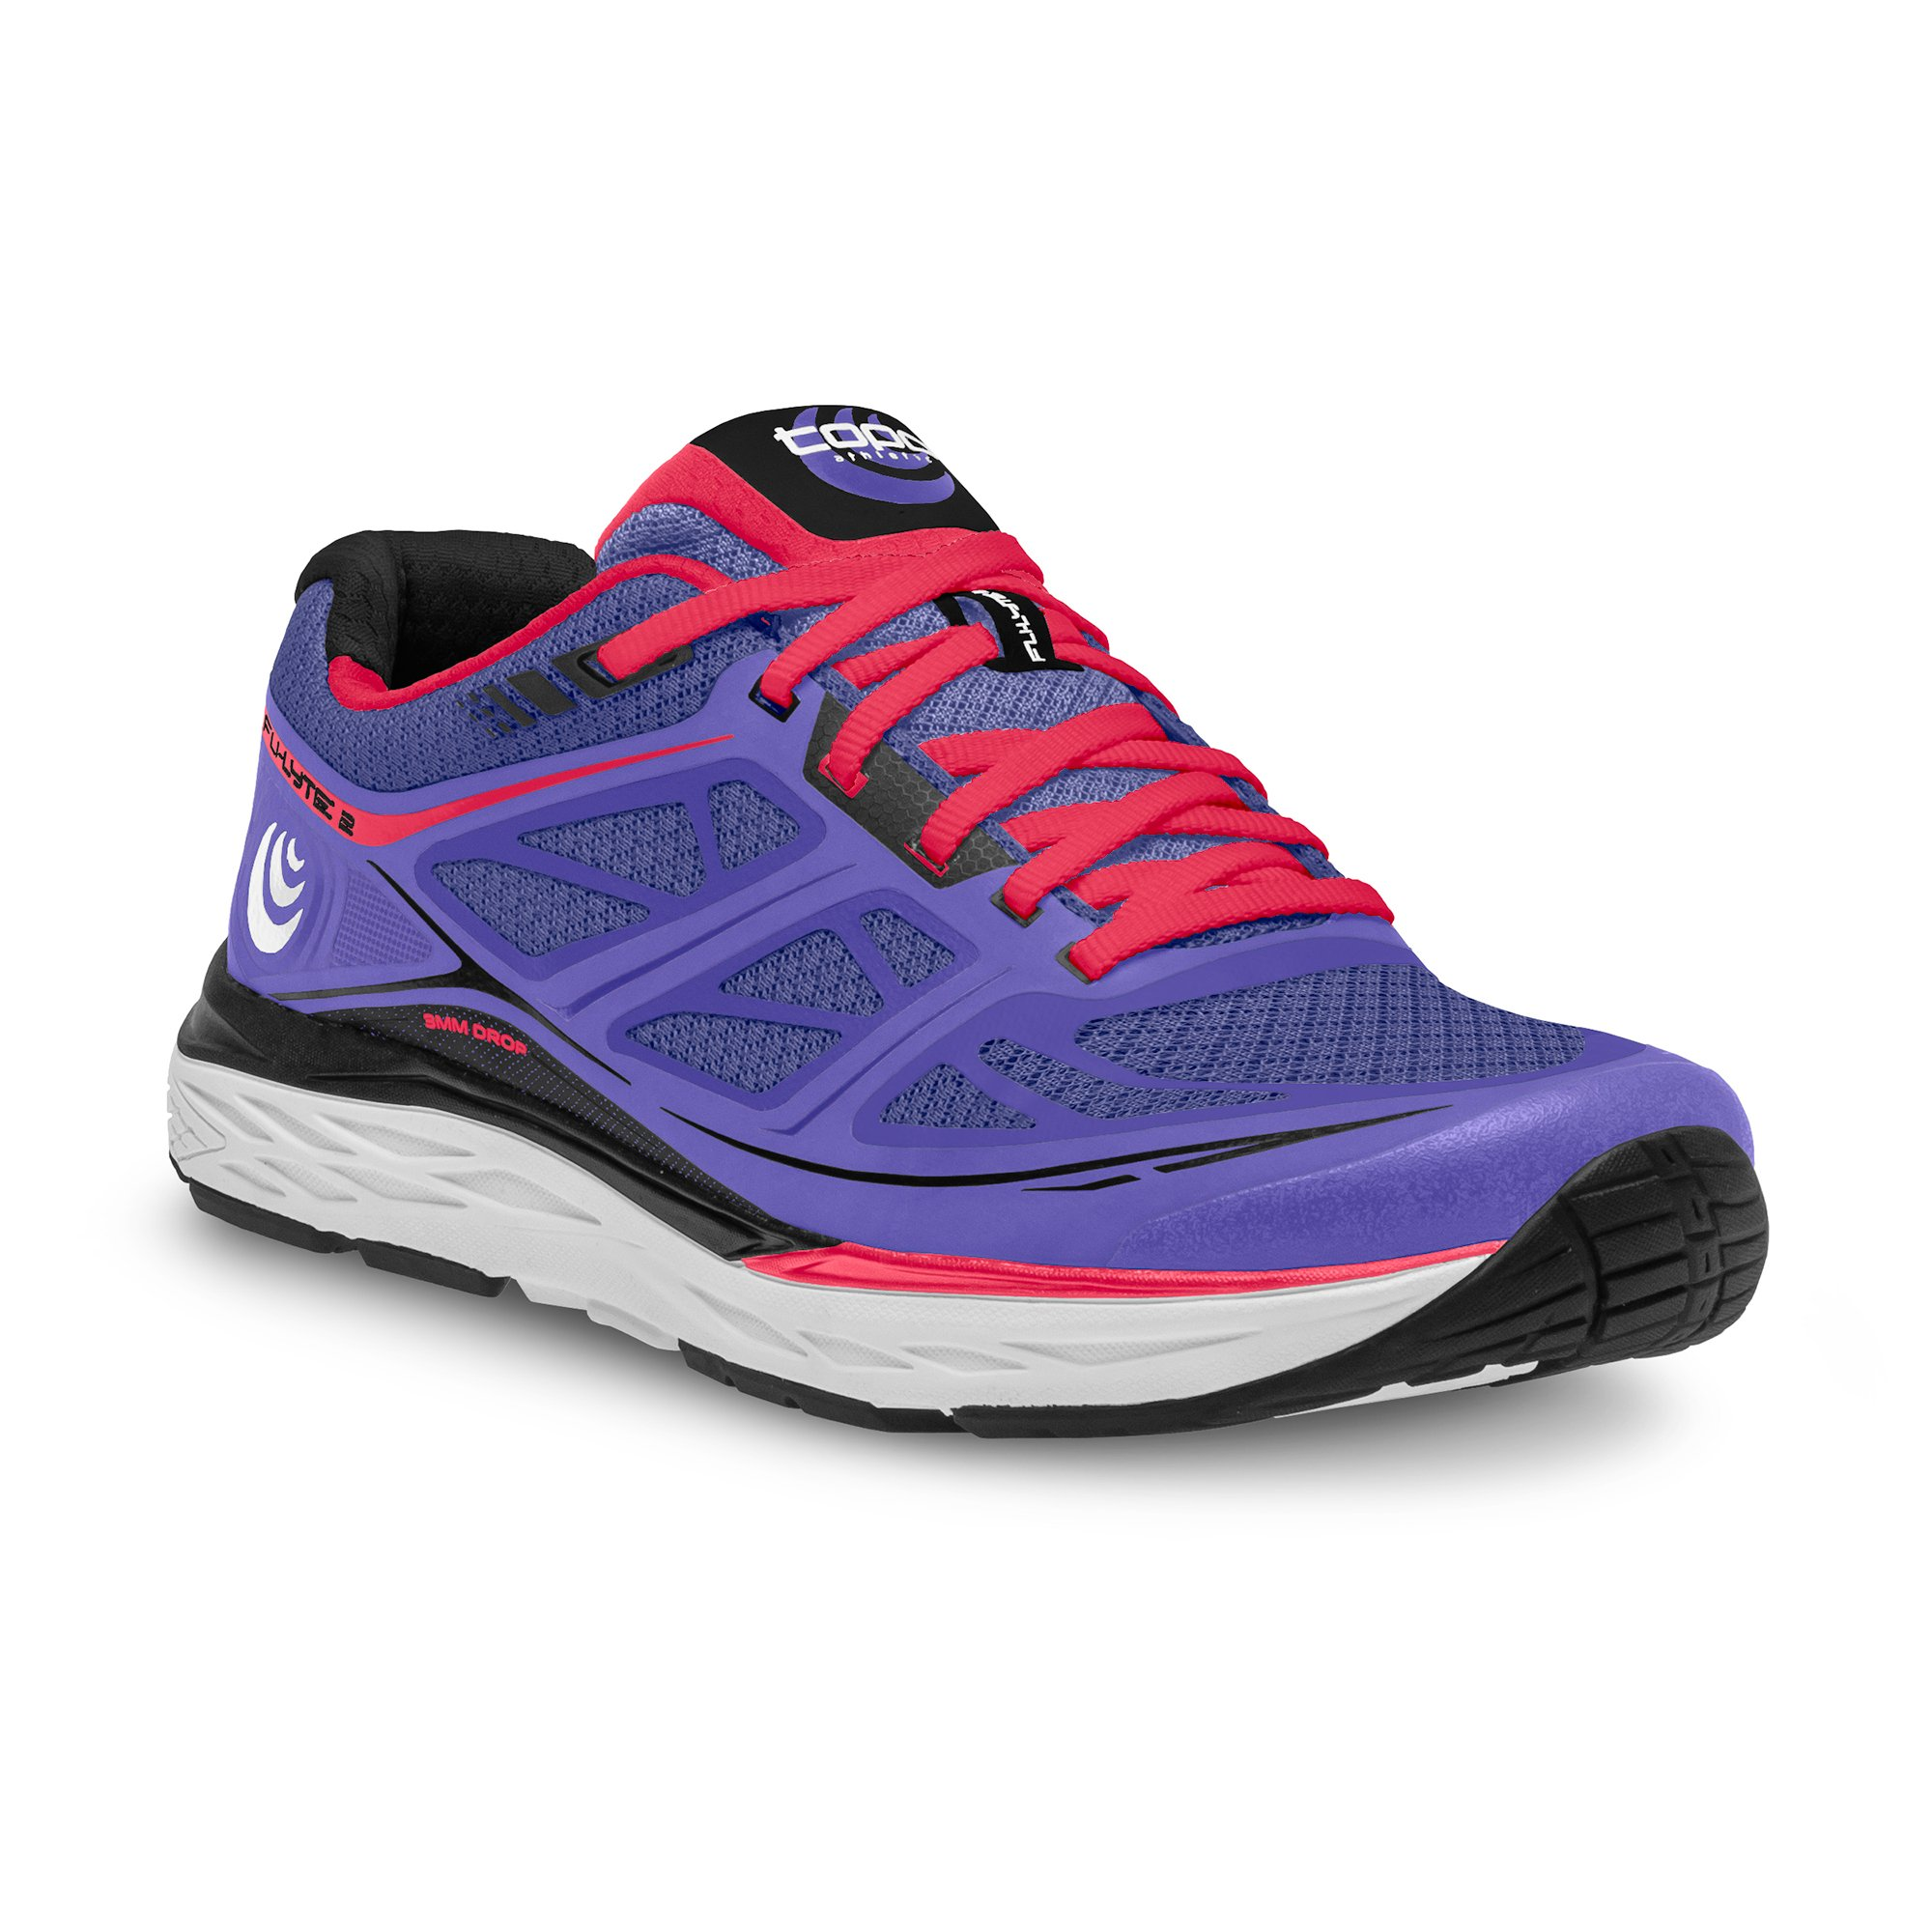 Topo Athletic FLI-Lyte 2 Running Shoes - Women's